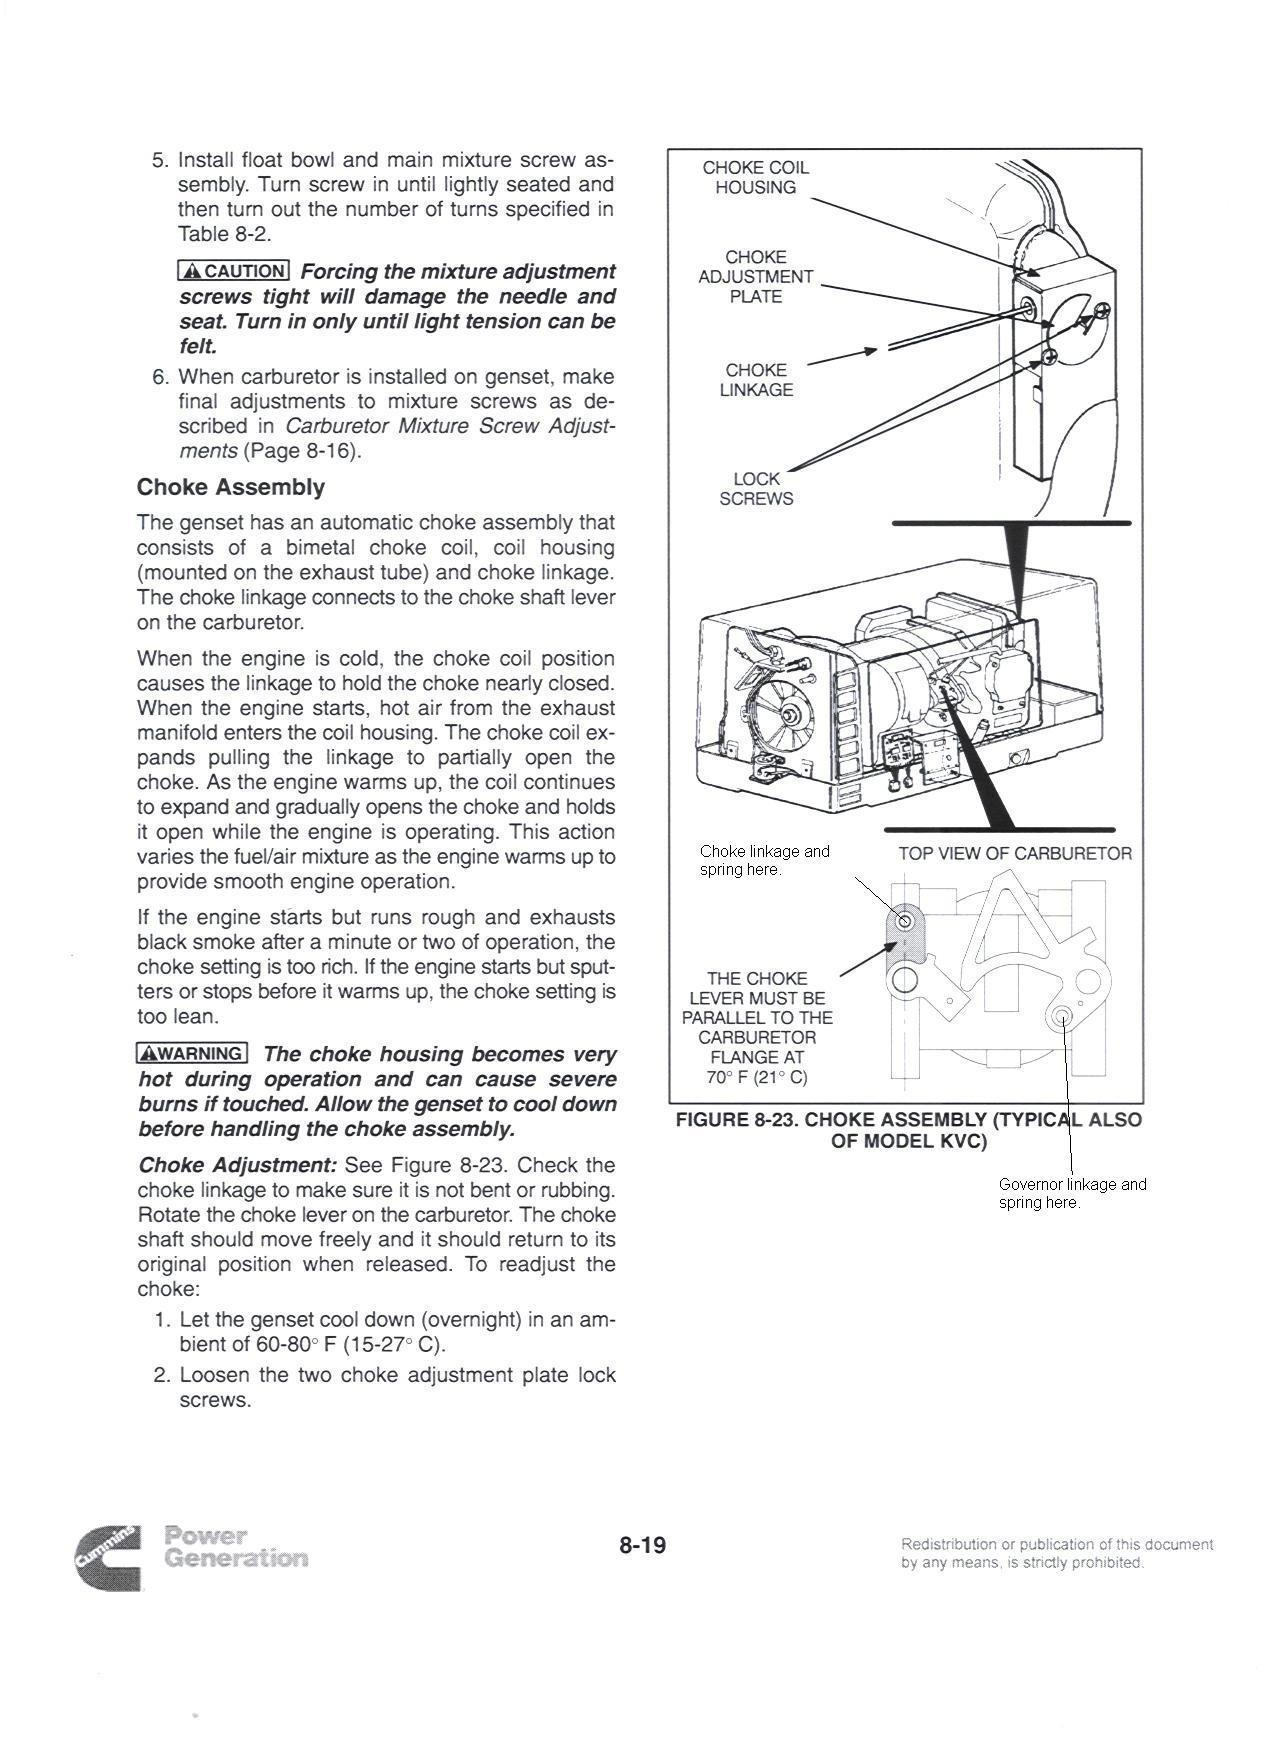 Kv 2800 Onan Wiring Diagram Wire Center Generator Schematic Kw Carburetor Library Of U2022 Rh Jessascott Co 6500 Homesite